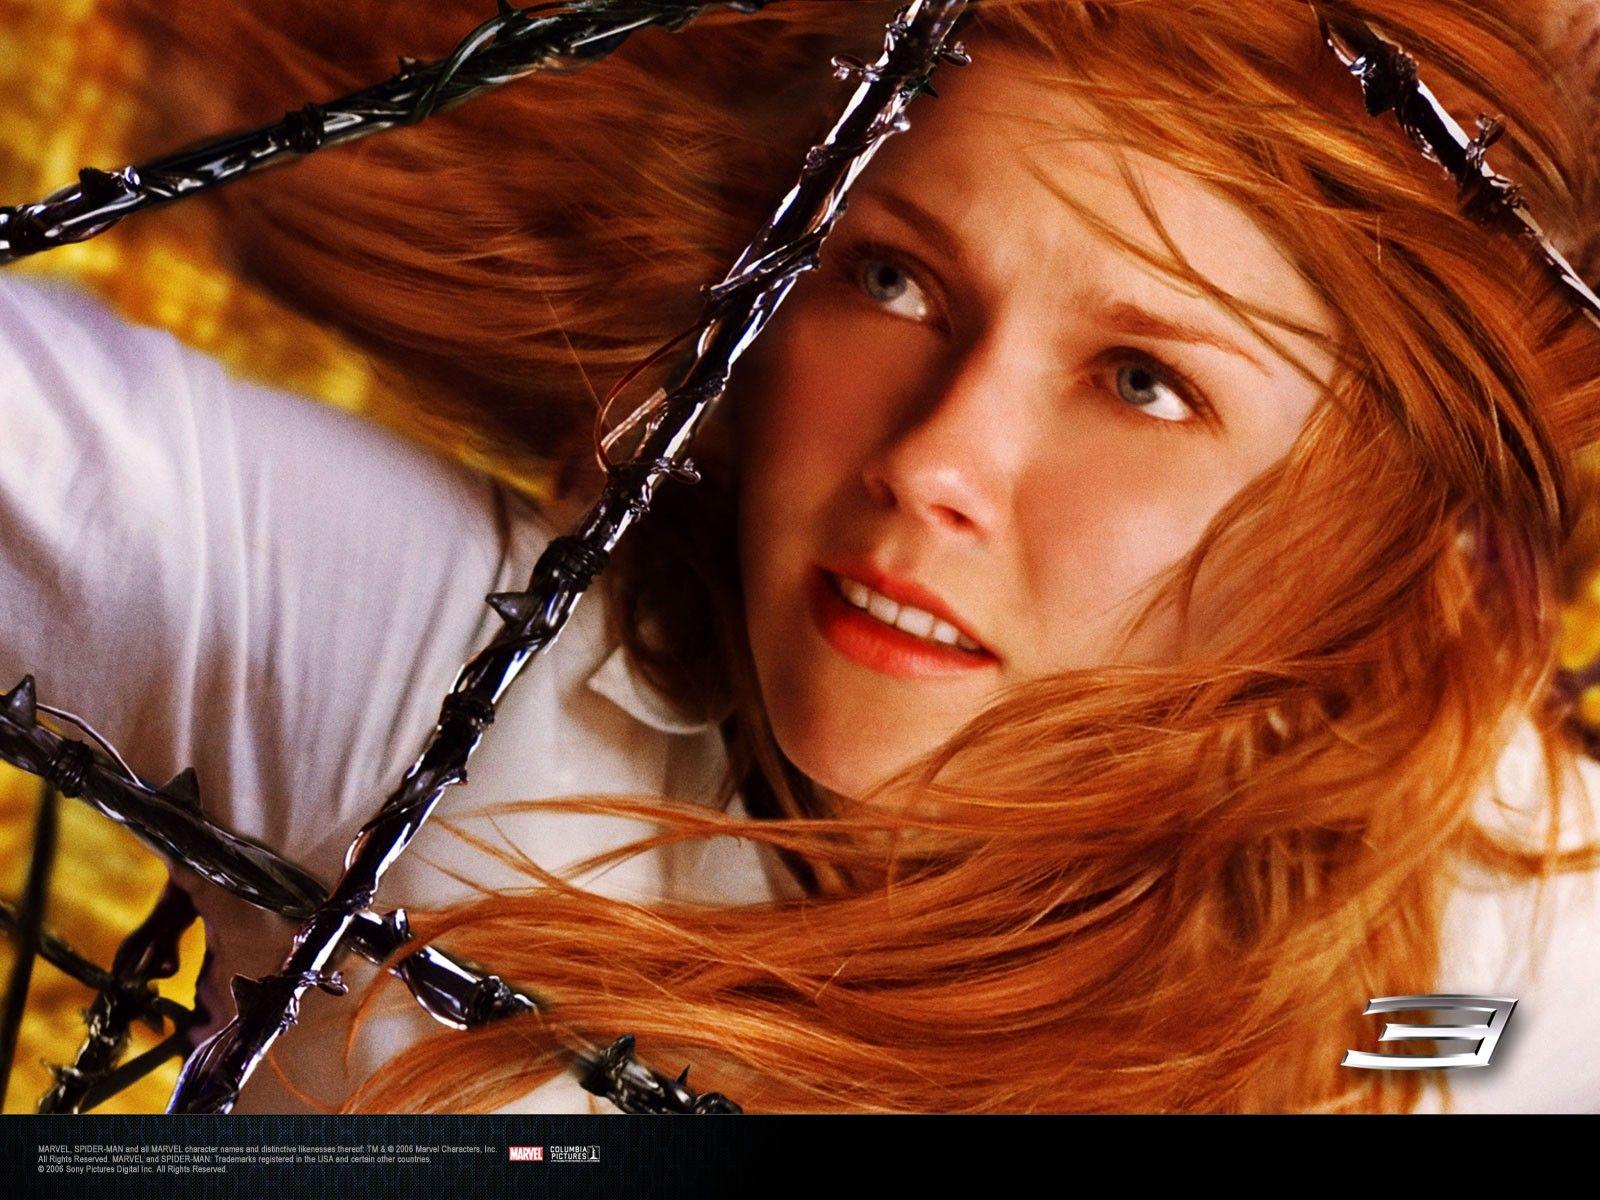 http://4.bp.blogspot.com/_RBdThqZjJII/TLT99ogKs6I/AAAAAAAAAMg/F6flyWe3crA/s1600/Spider_Man_3_Kirsten%2520Dunst_B-370063.jpg